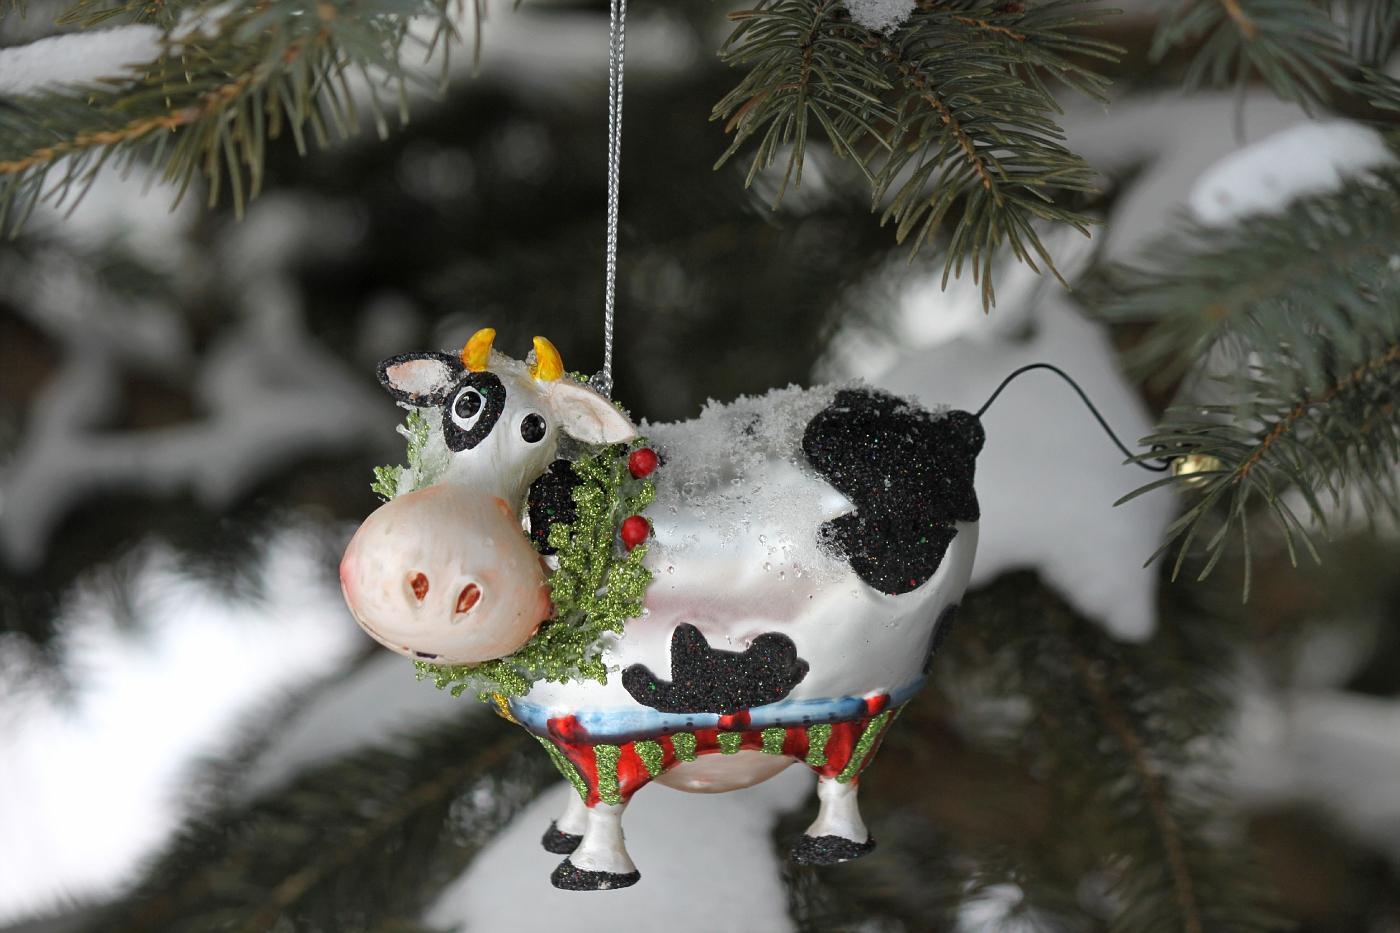 Cow Ornament #3